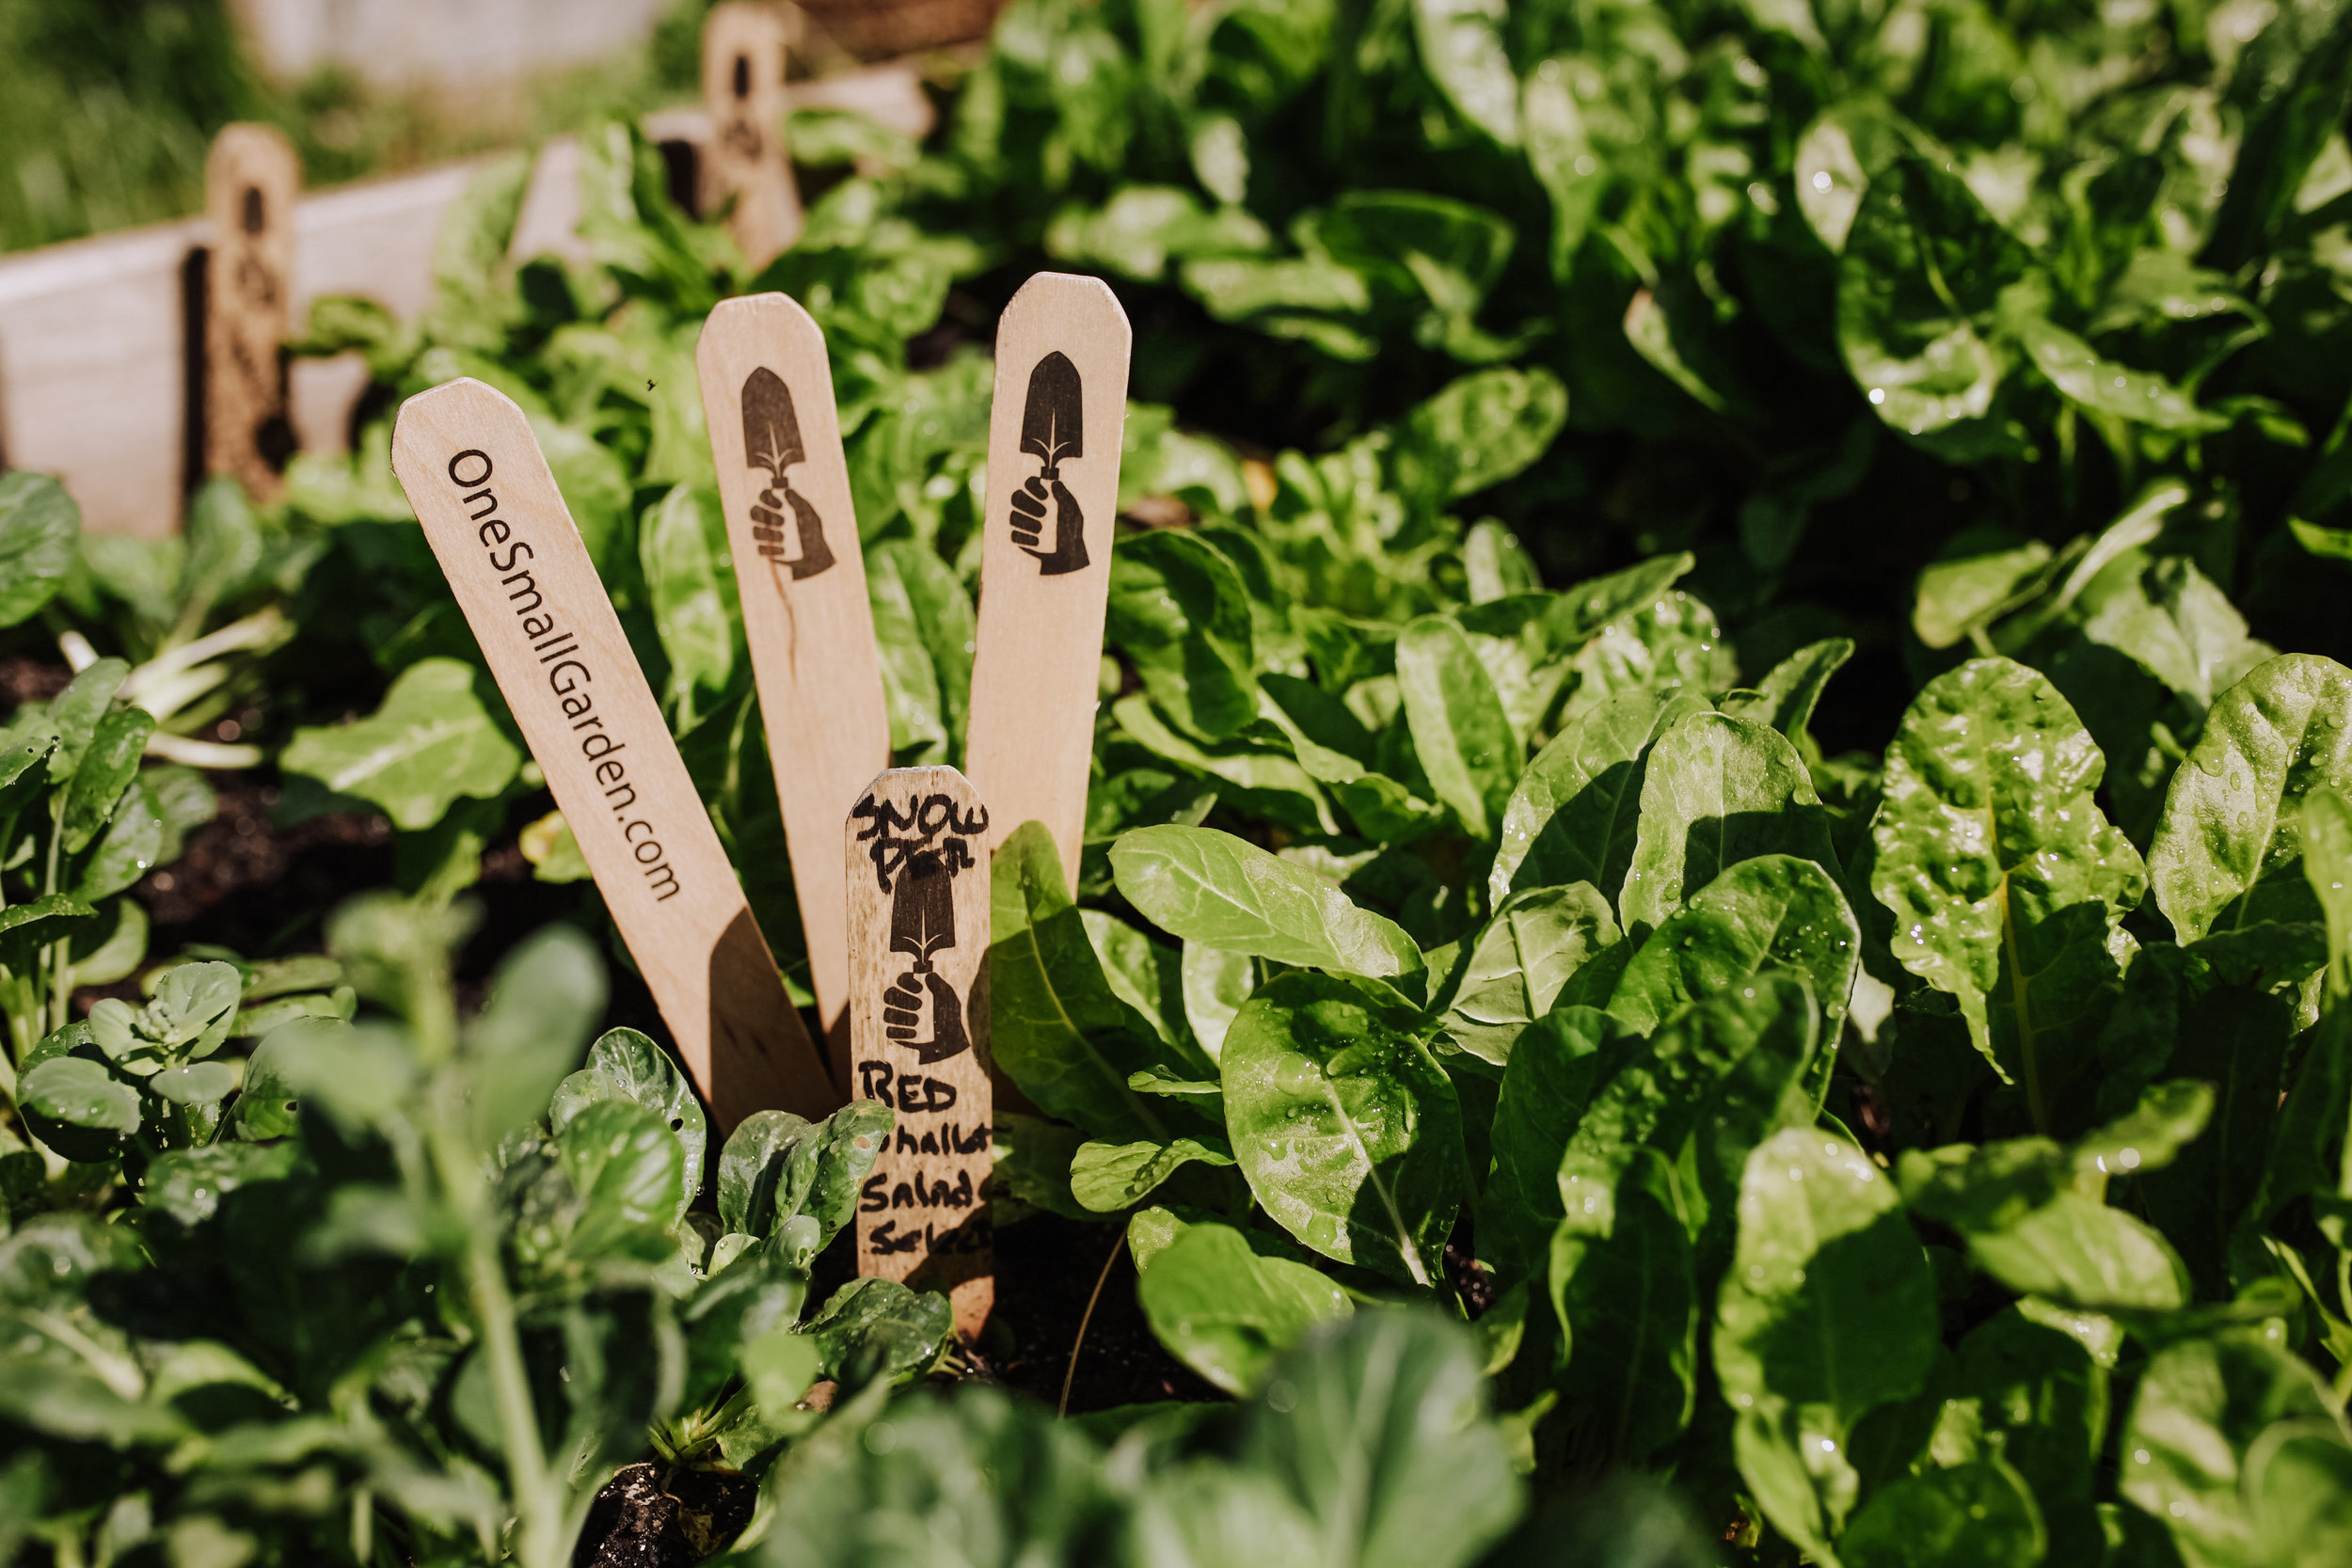 """To plant a garden is to believe in tomorrow."" - - Audrey Hepburn"